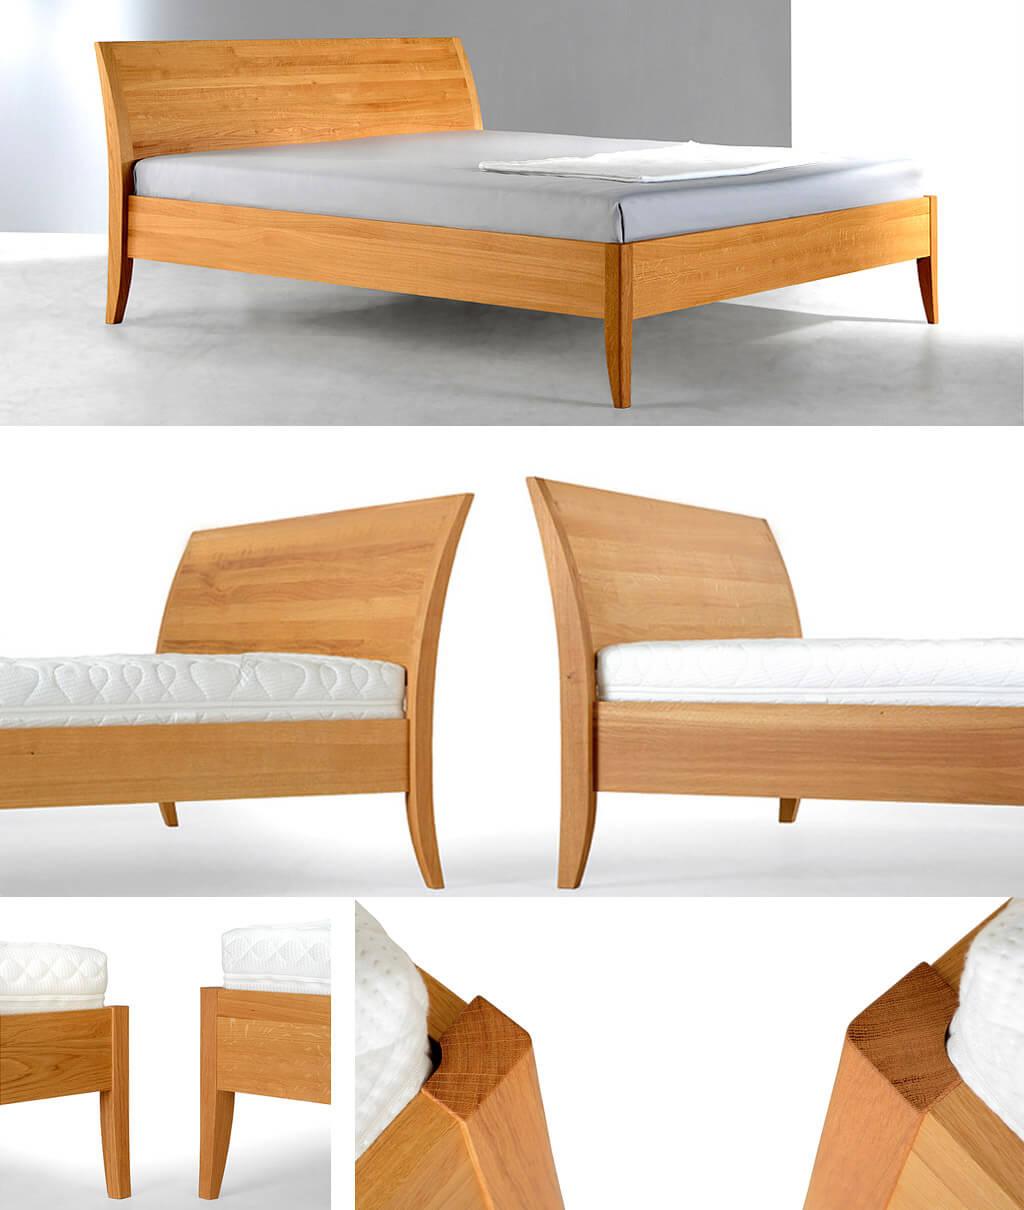 Coburger-Werksta-tten-Massivholzbett-Classico-Pro-Produktmerkmale-und-Details